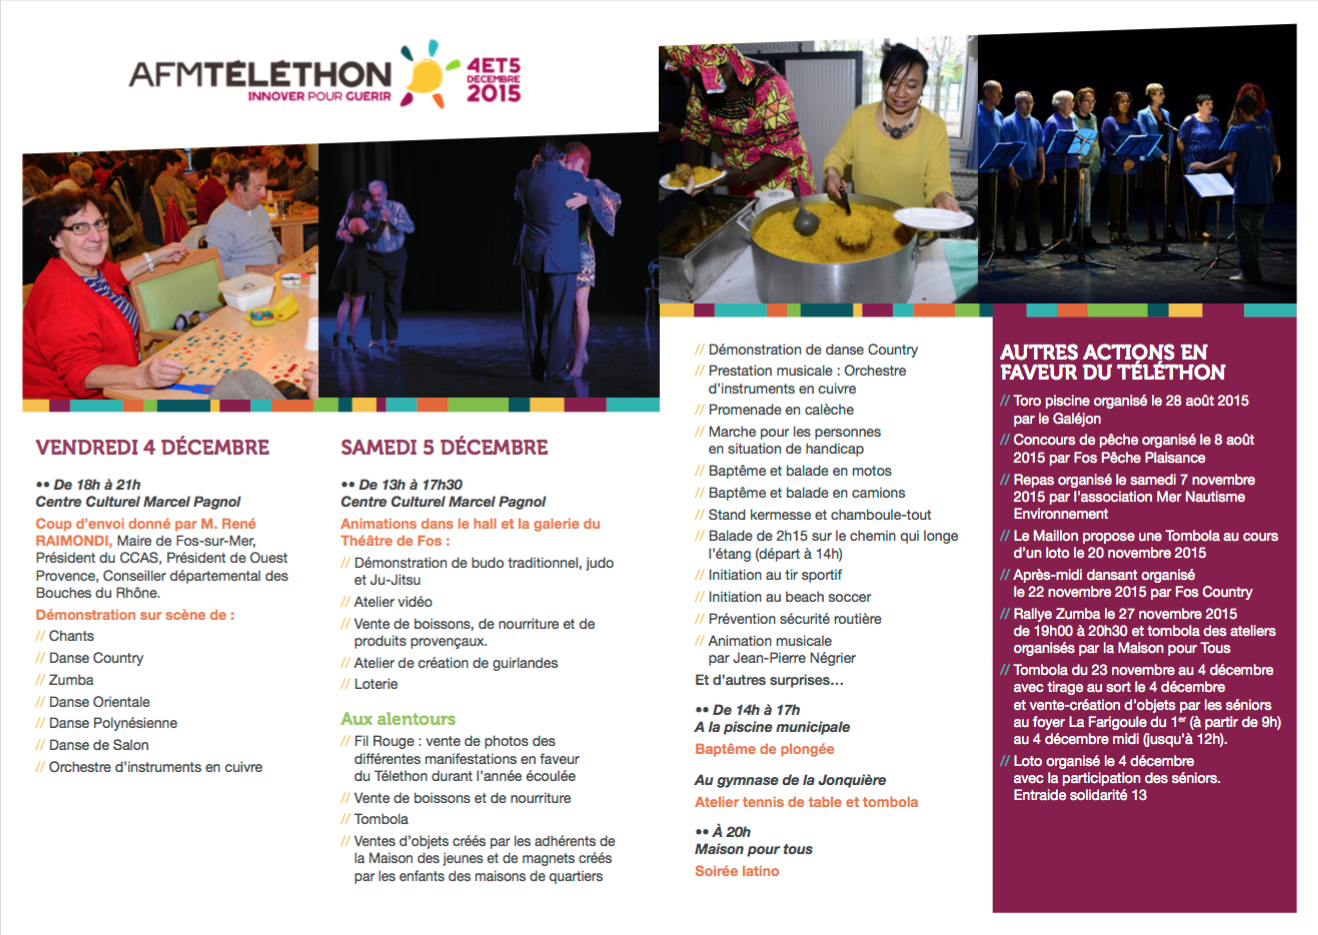 Programme Téléthon Fos-sur-Mer 2015